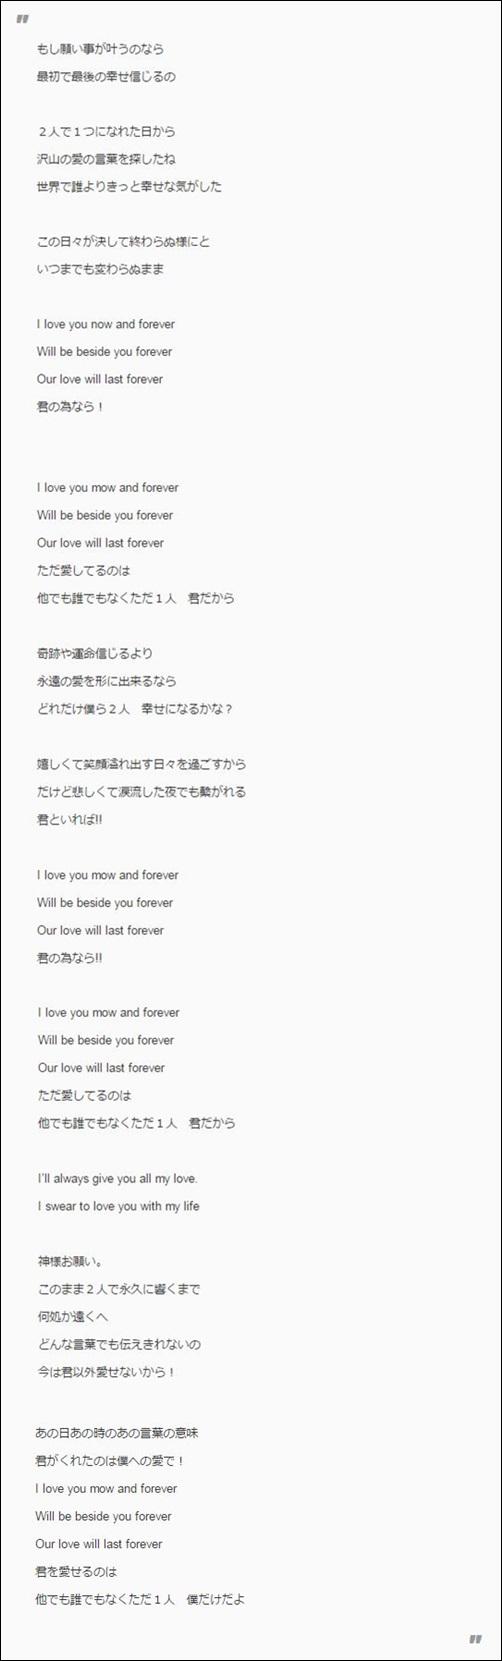 MY FIRST STORYの名歌詞&名言!Takaの弟Hiroならではの名言も、LOVE LETTER